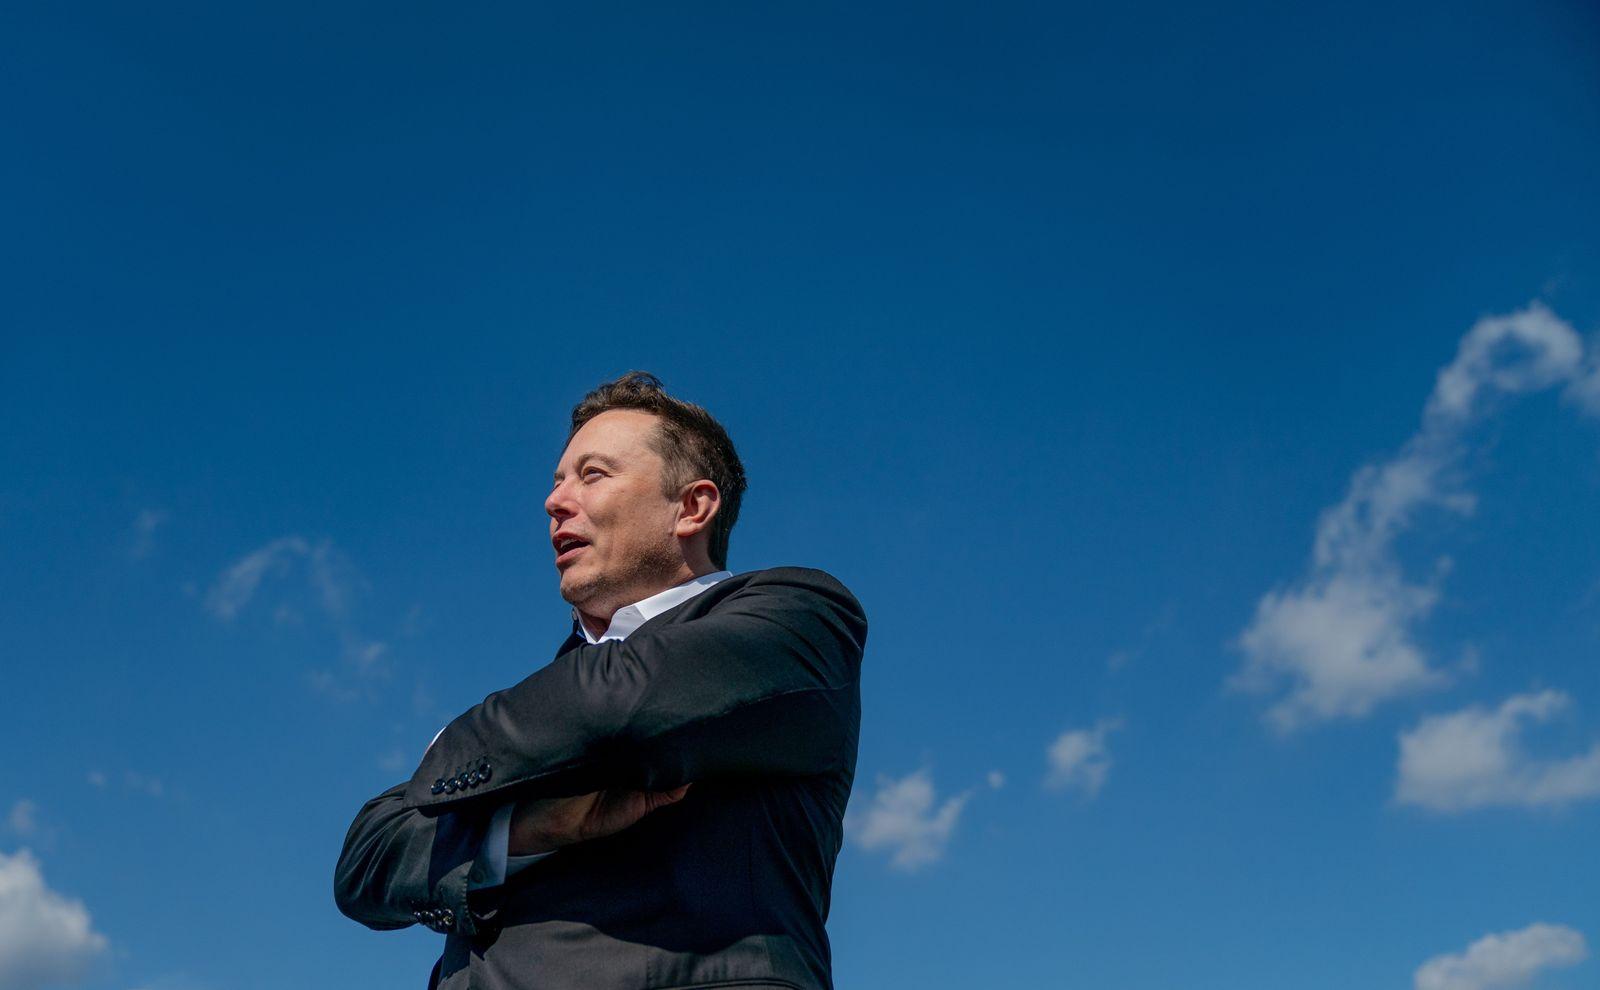 Elon Musk in Germany, Gruenheide - 03 Sep 2020